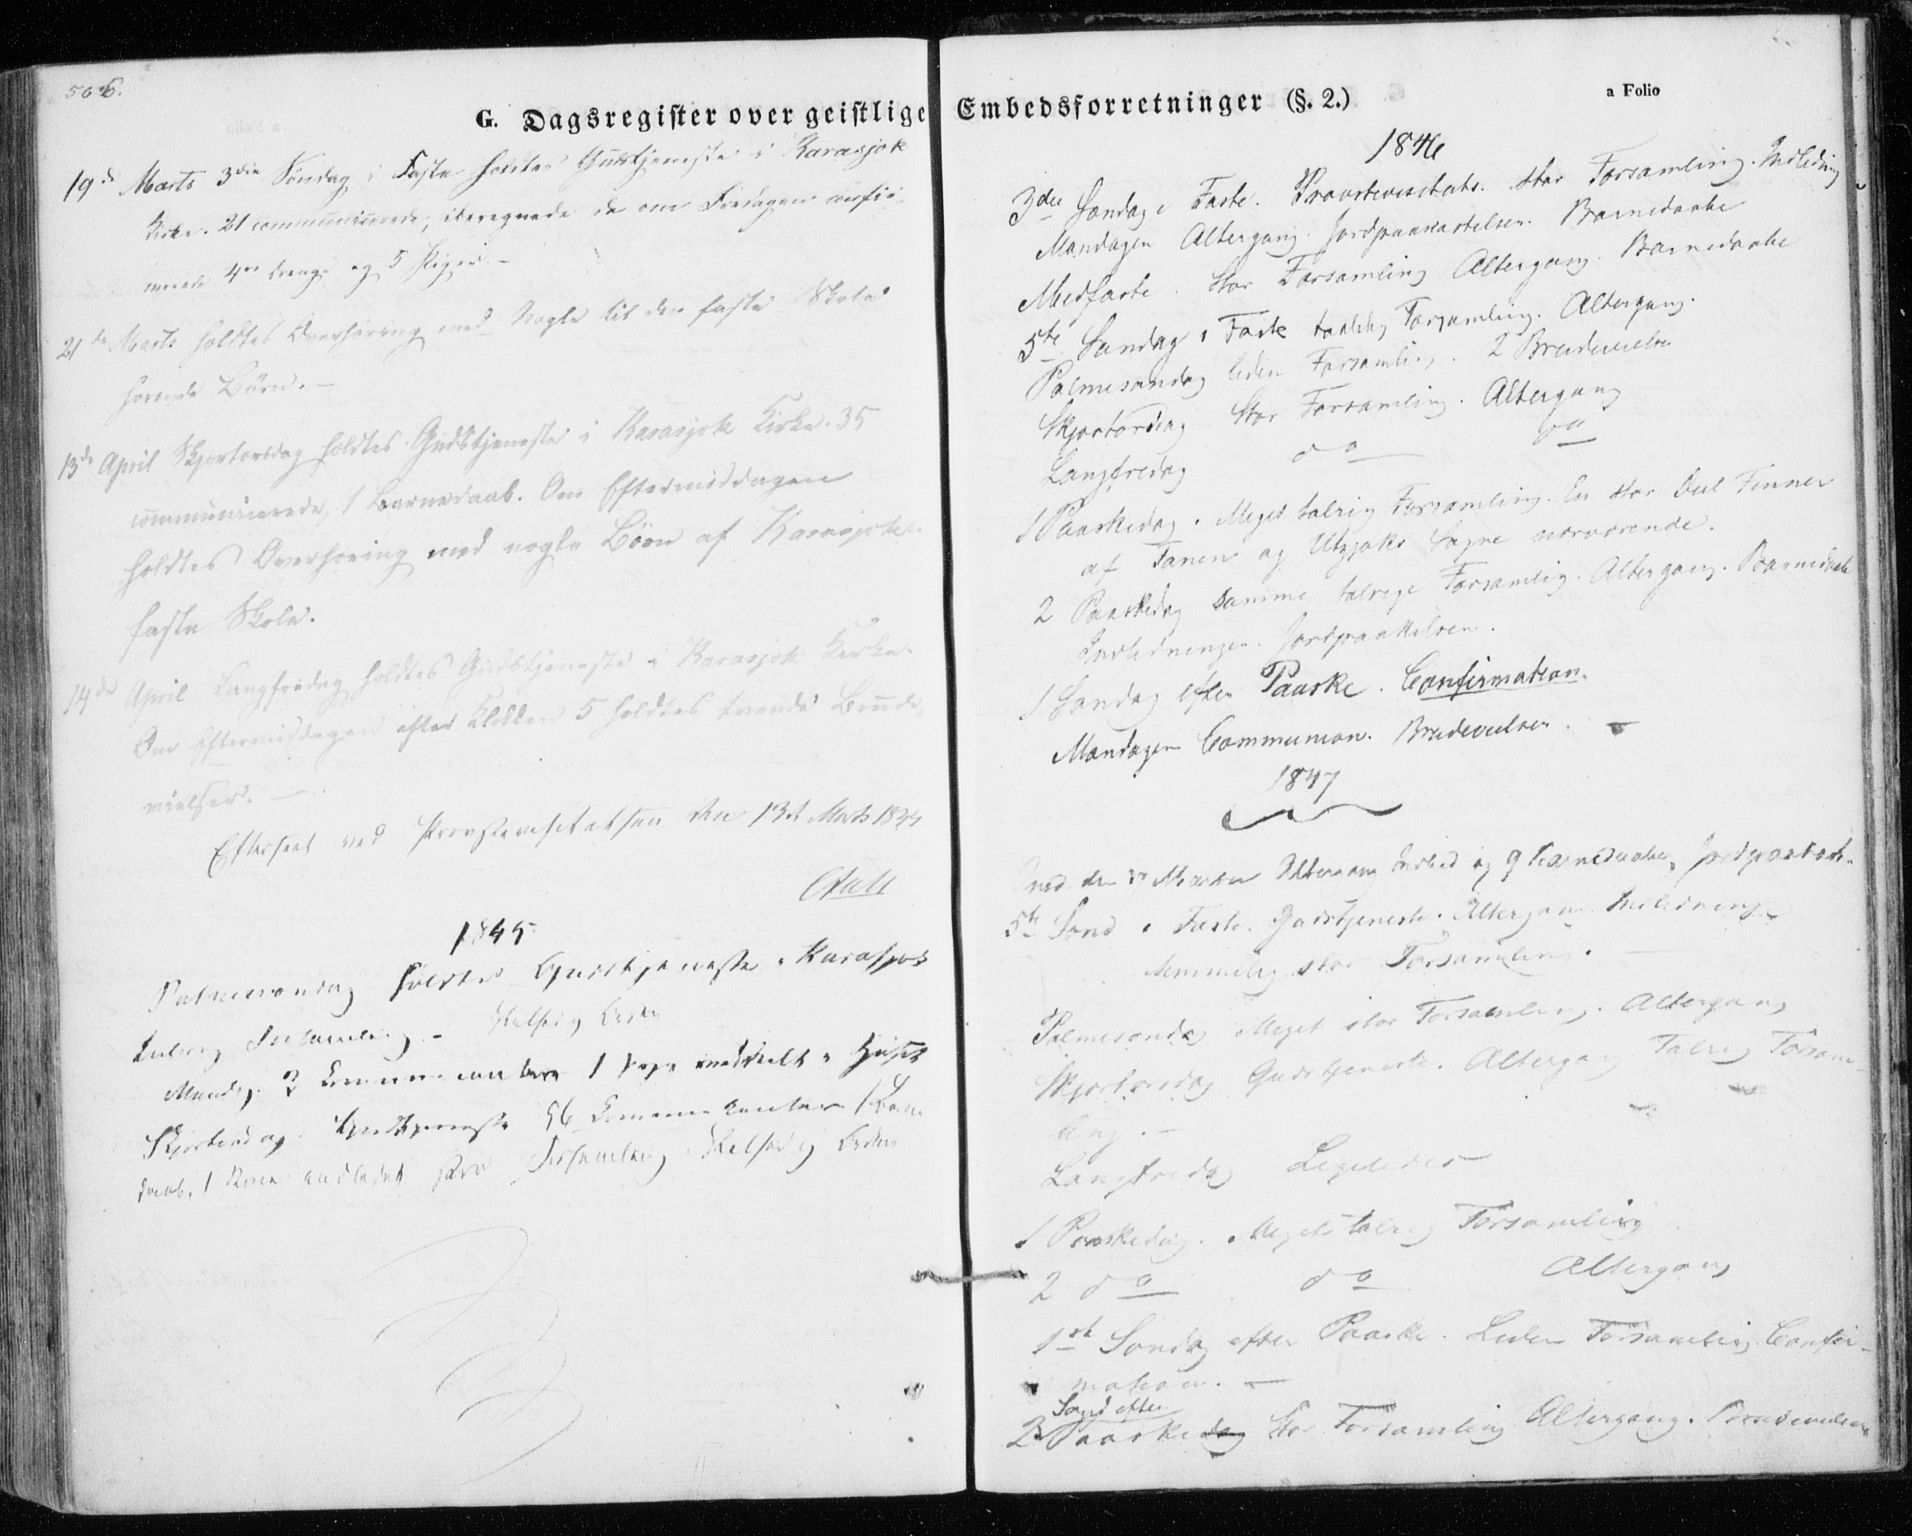 SATØ, Kistrand/Porsanger sokneprestembete, H/Ha/L0012.kirke: Ministerialbok nr. 12, 1843-1871, s. 566-567